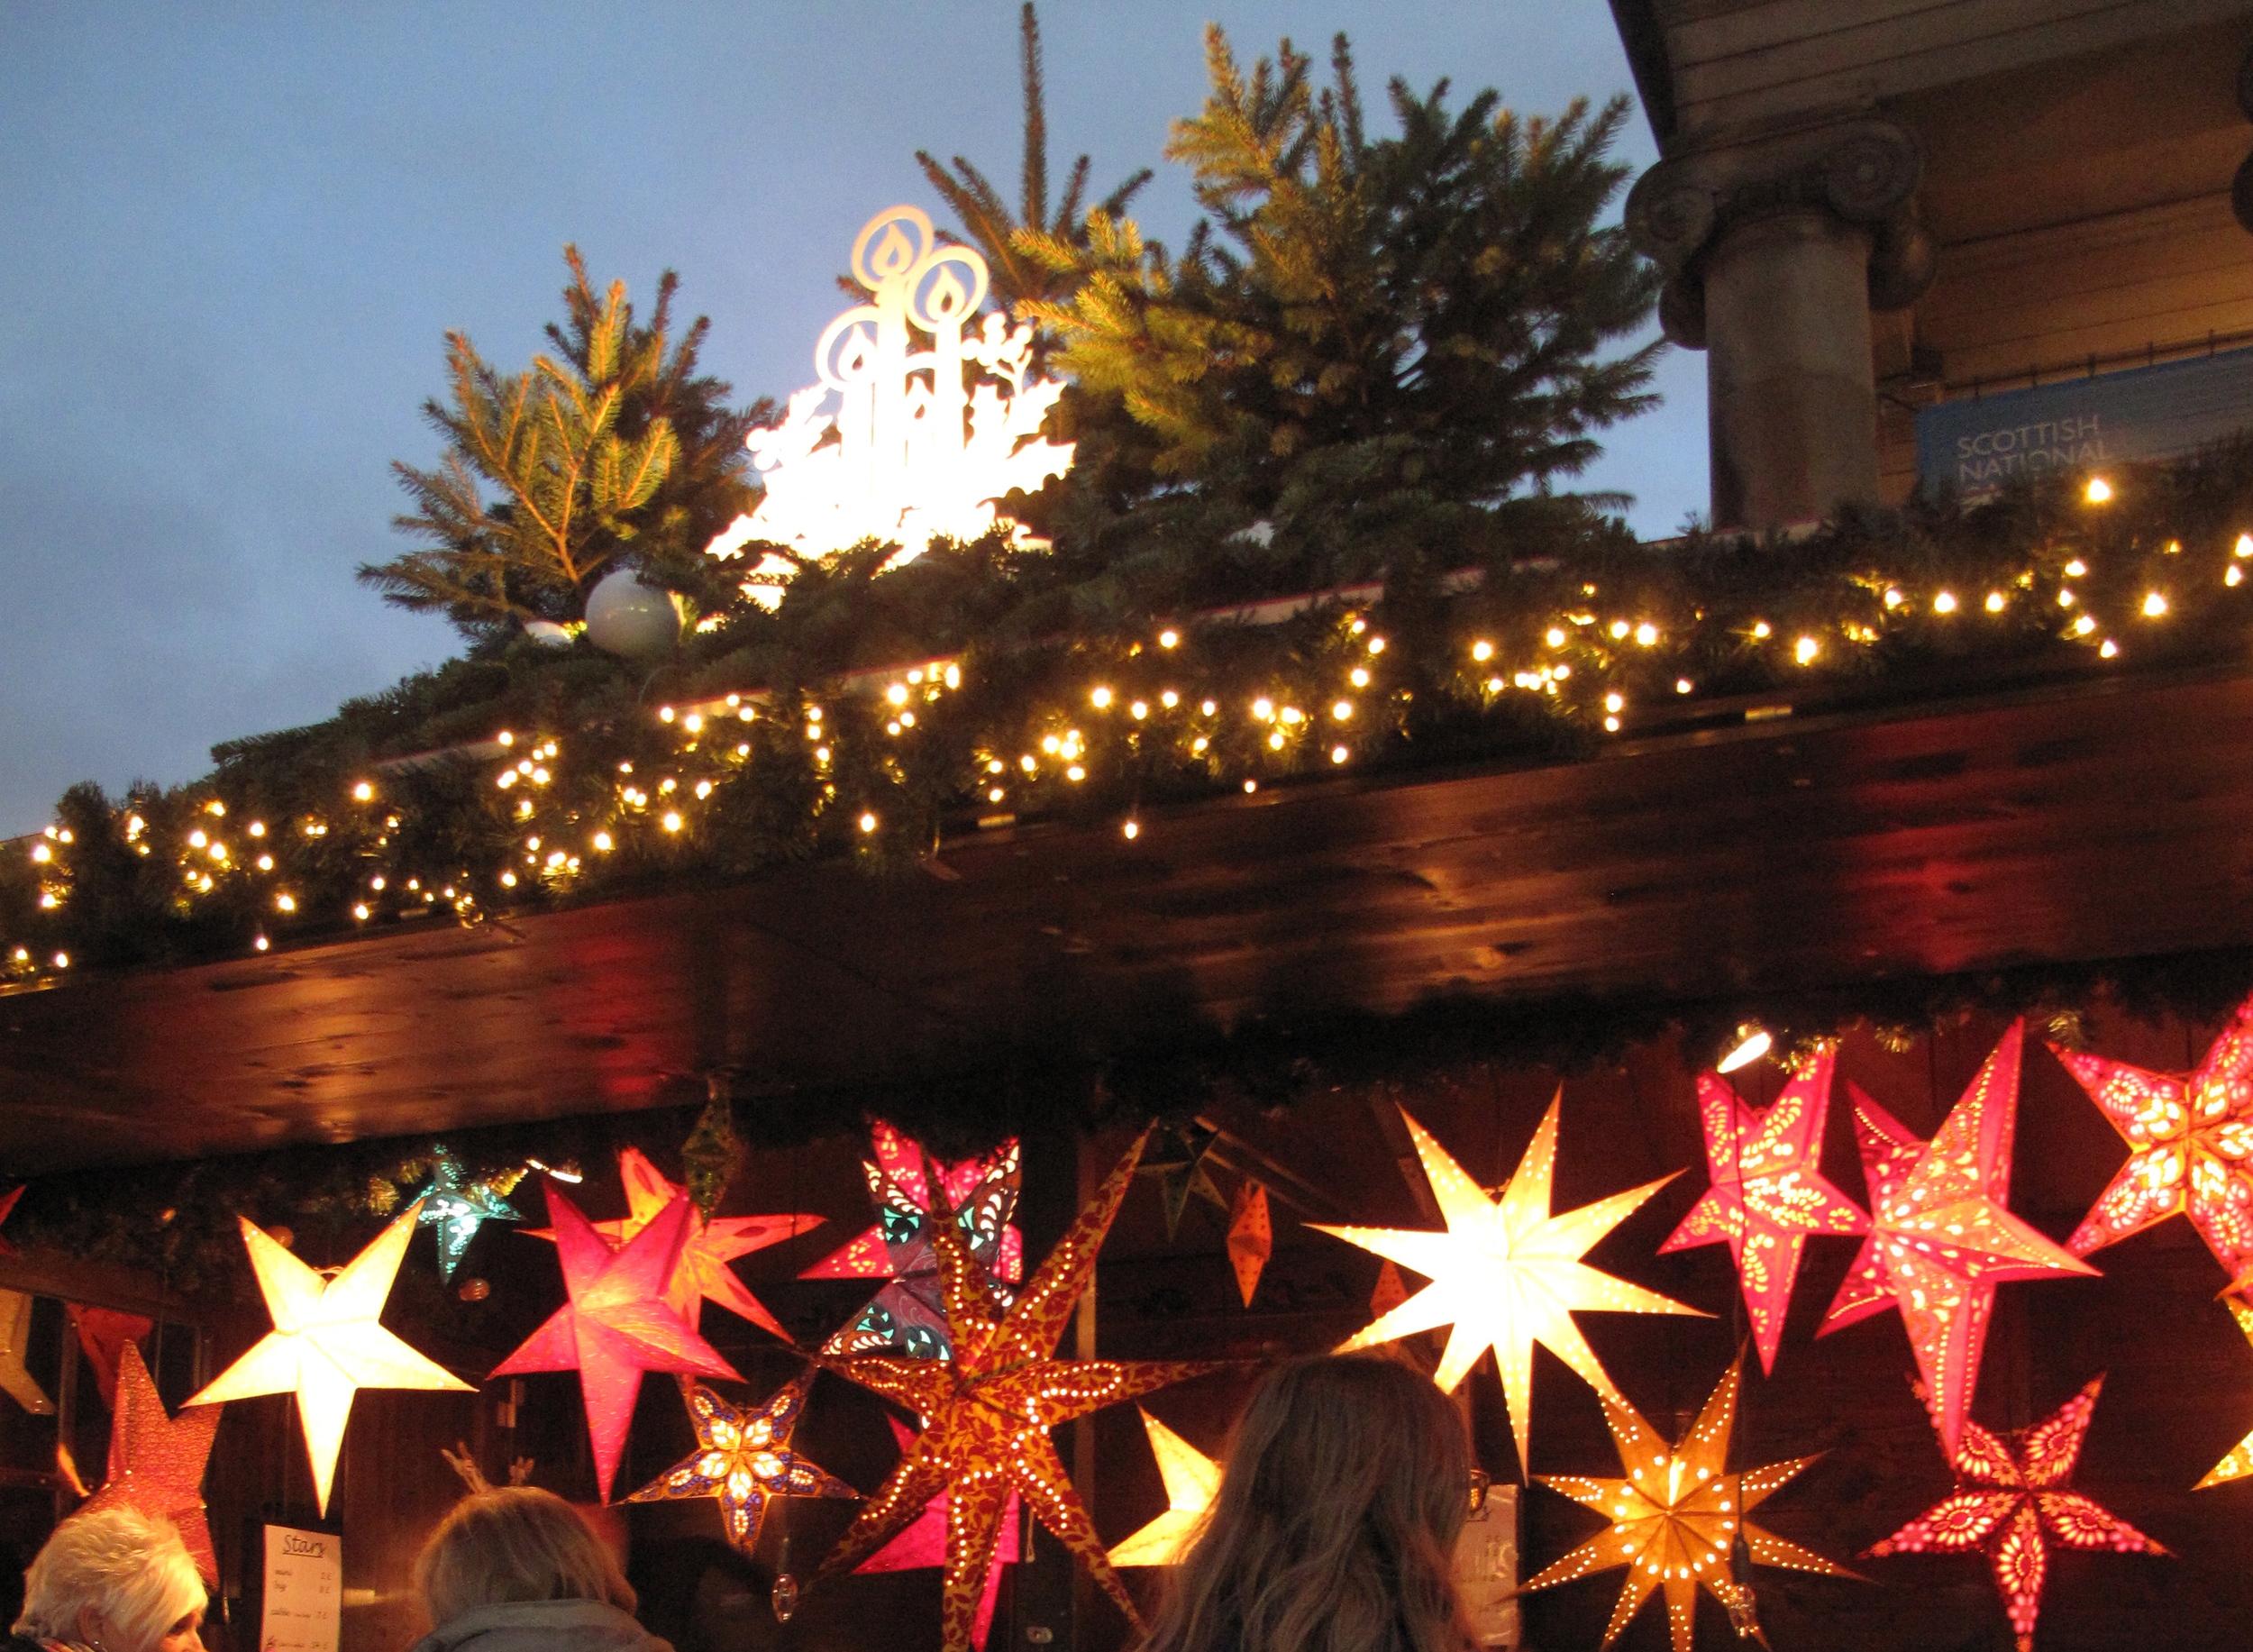 Star lanterns at the Edinburgh Christmas market, all lit up at night.